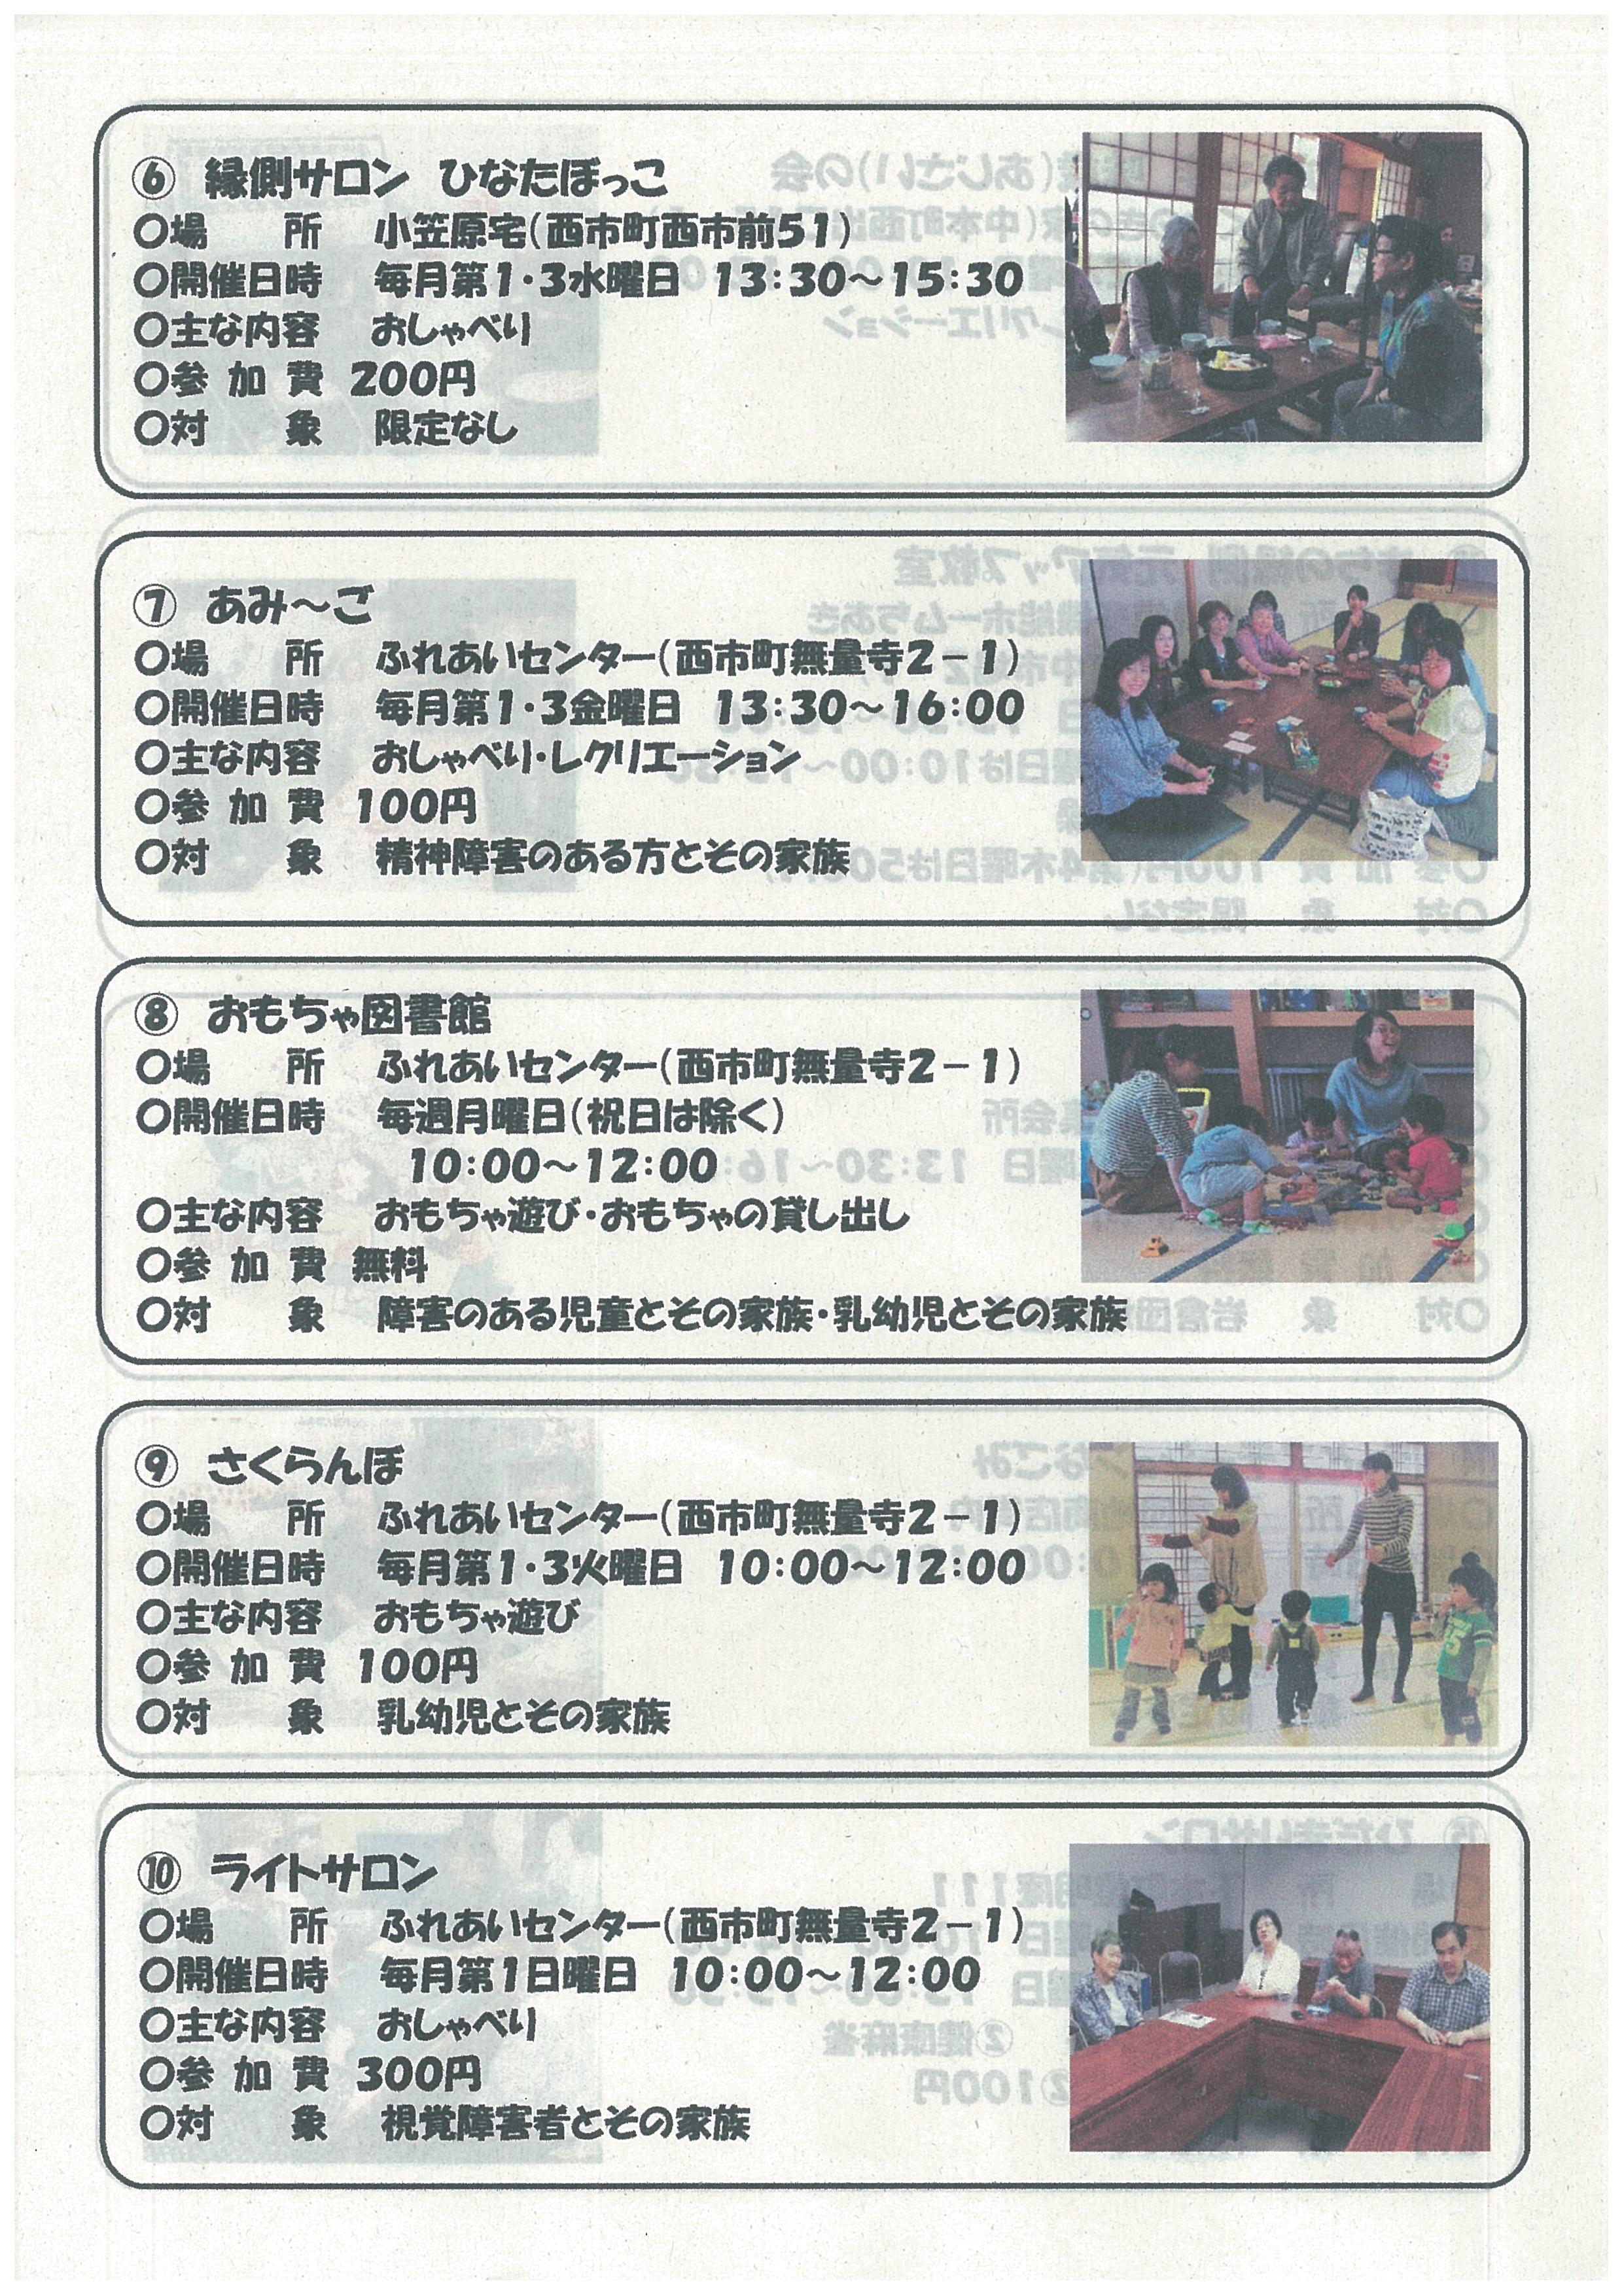 scan-001_2020092517013726a.jpg